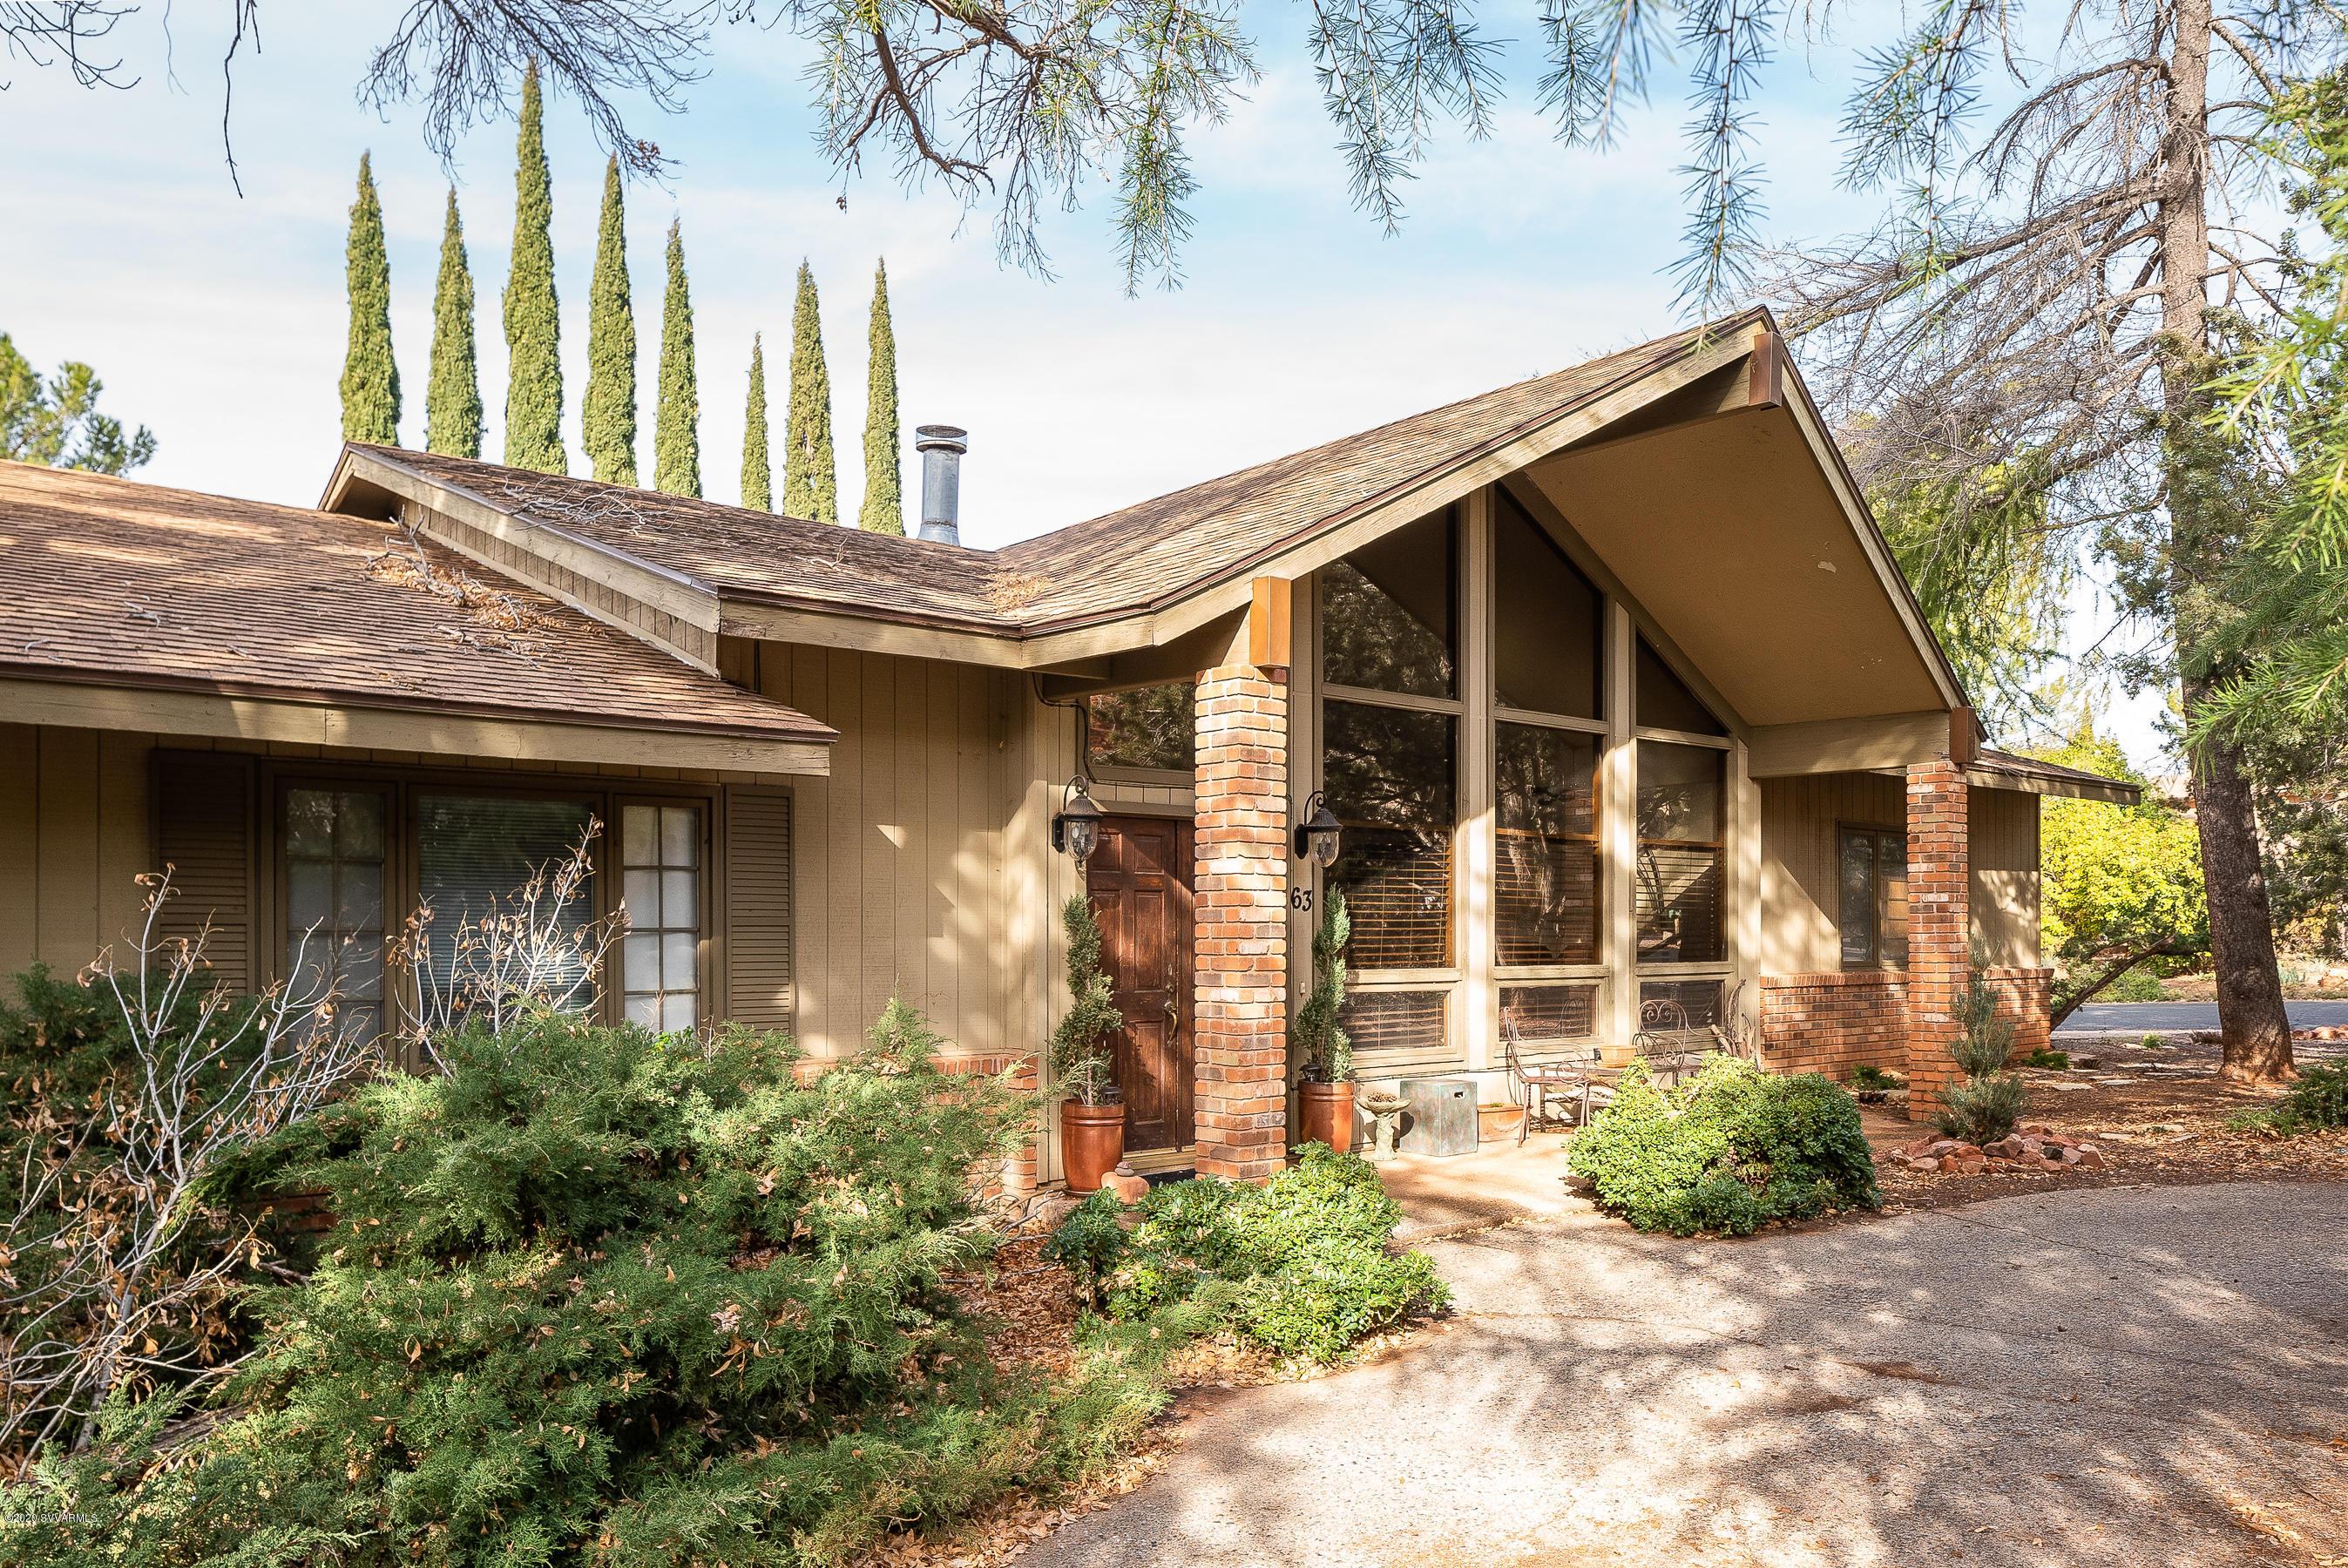 63 Antelope Drive Sedona, AZ 86336